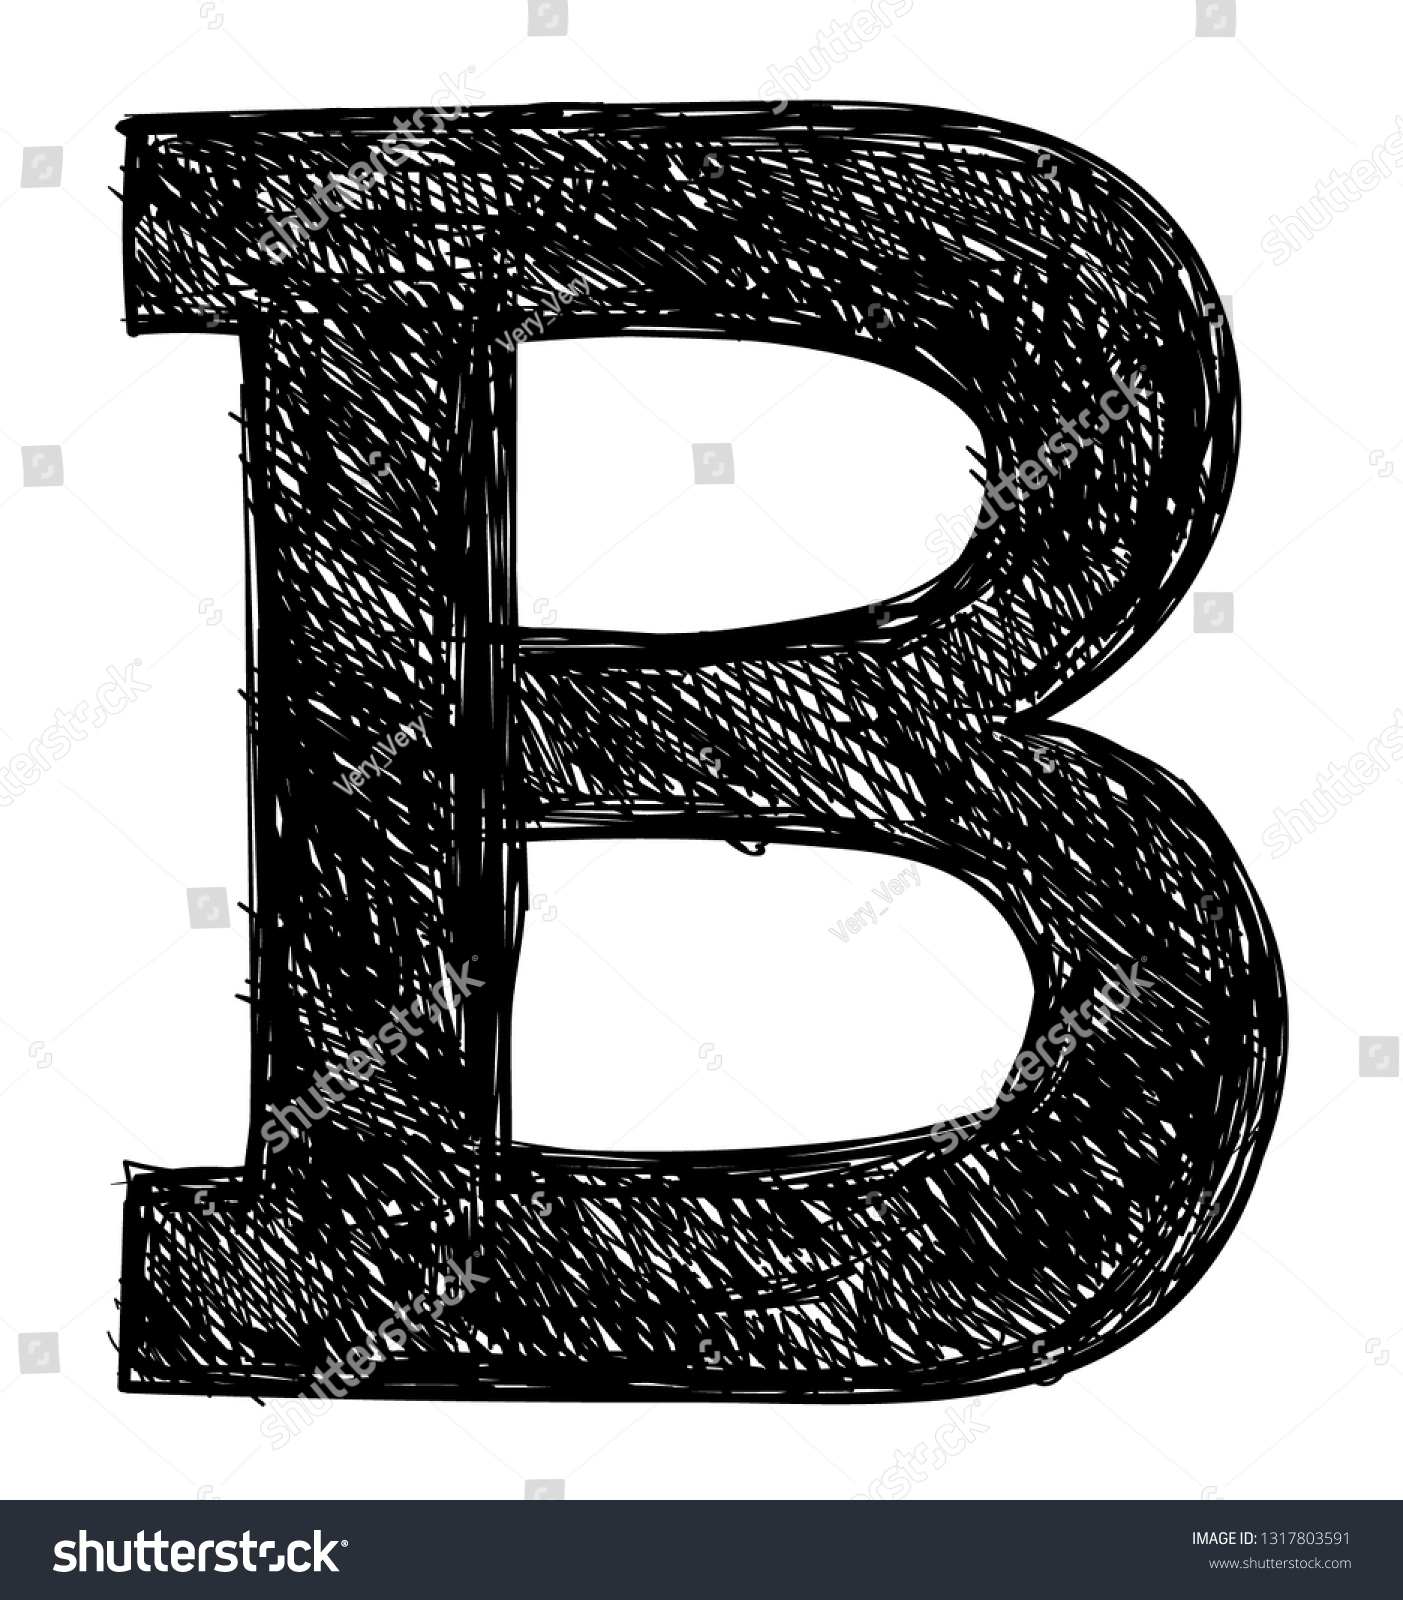 Letter b pencil sketch black color stock vector royalty